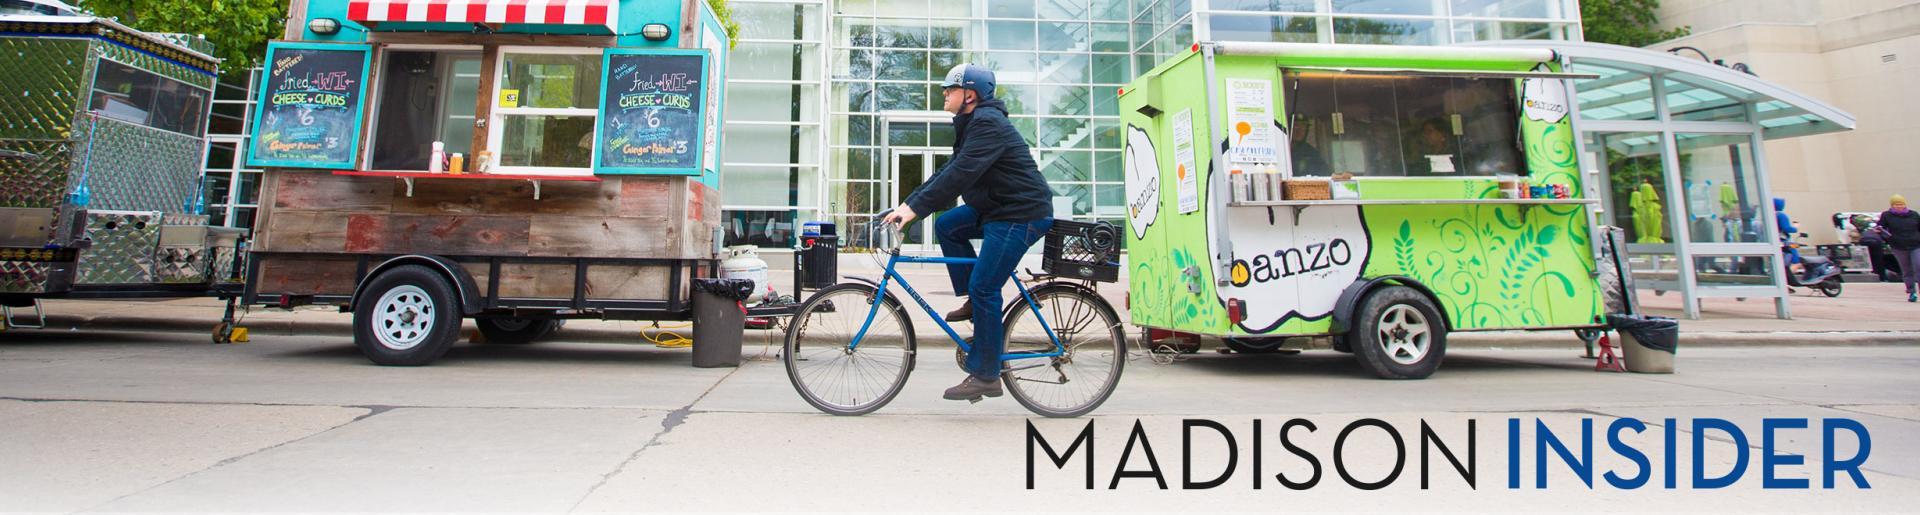 Madison Insider - Spring!